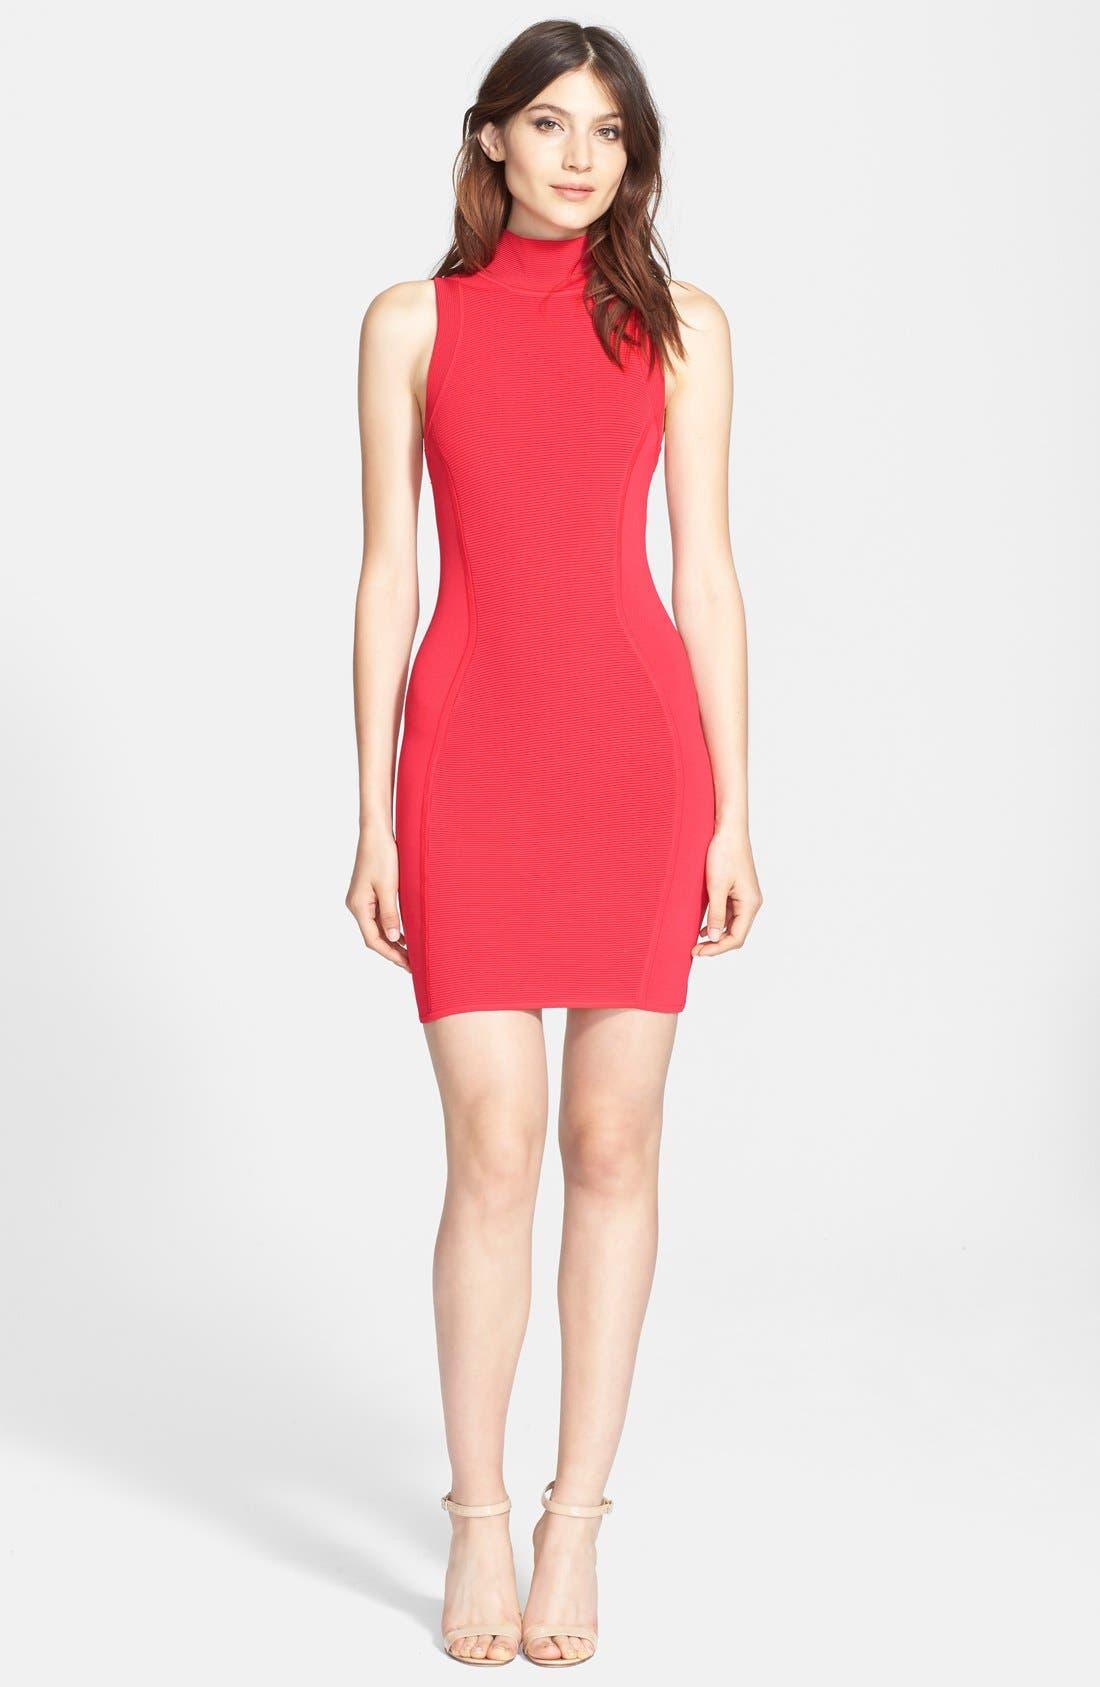 Alternate Image 1 Selected - Parker 'Amy' Knit Turtleneck Body-Con Dress